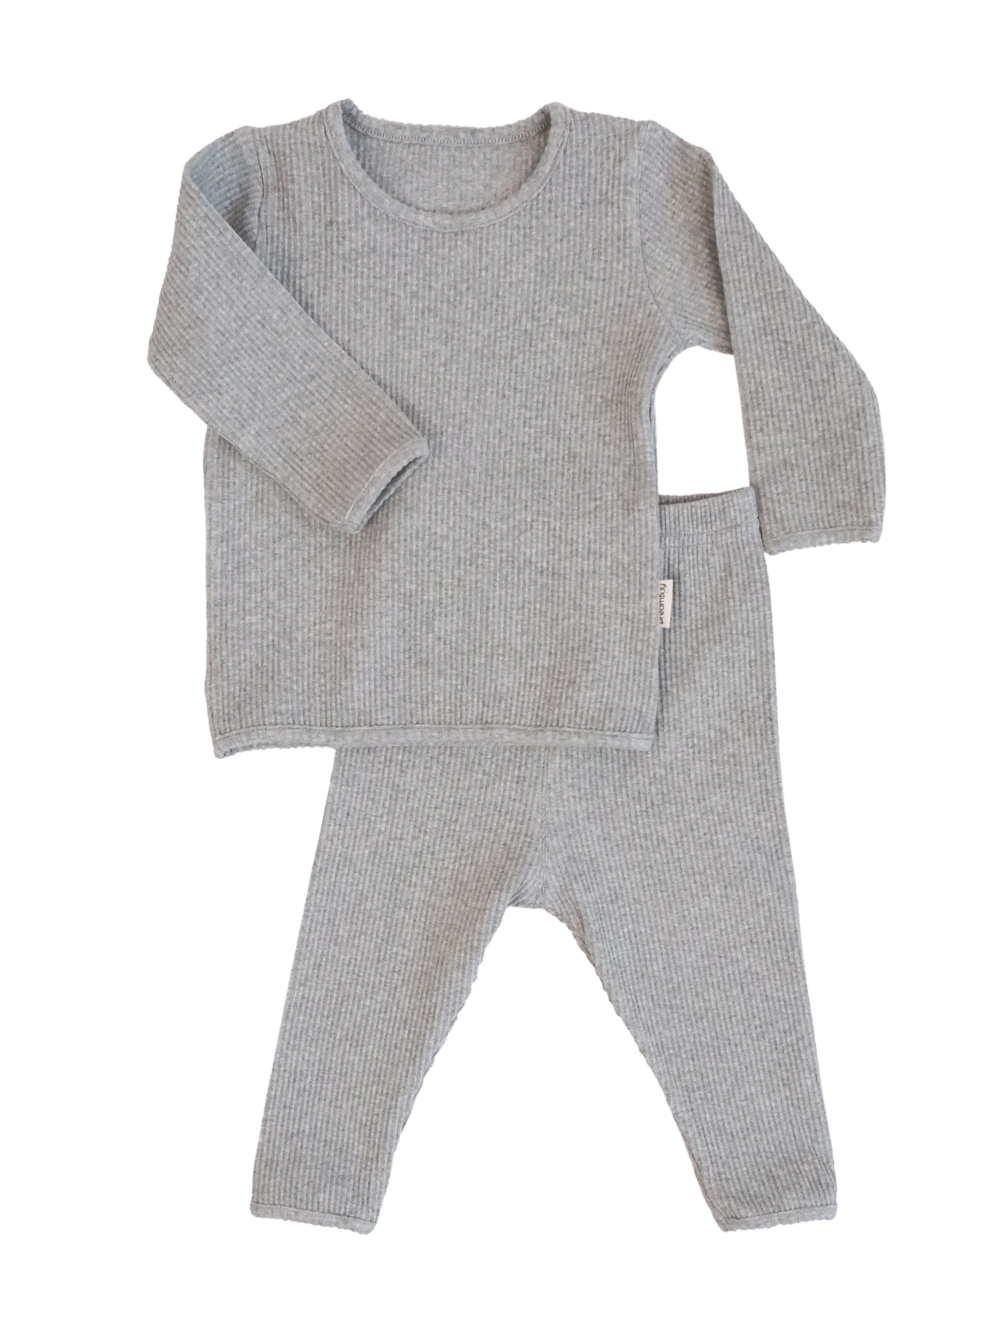 Personalised Ribbed Lounge Set - Grey